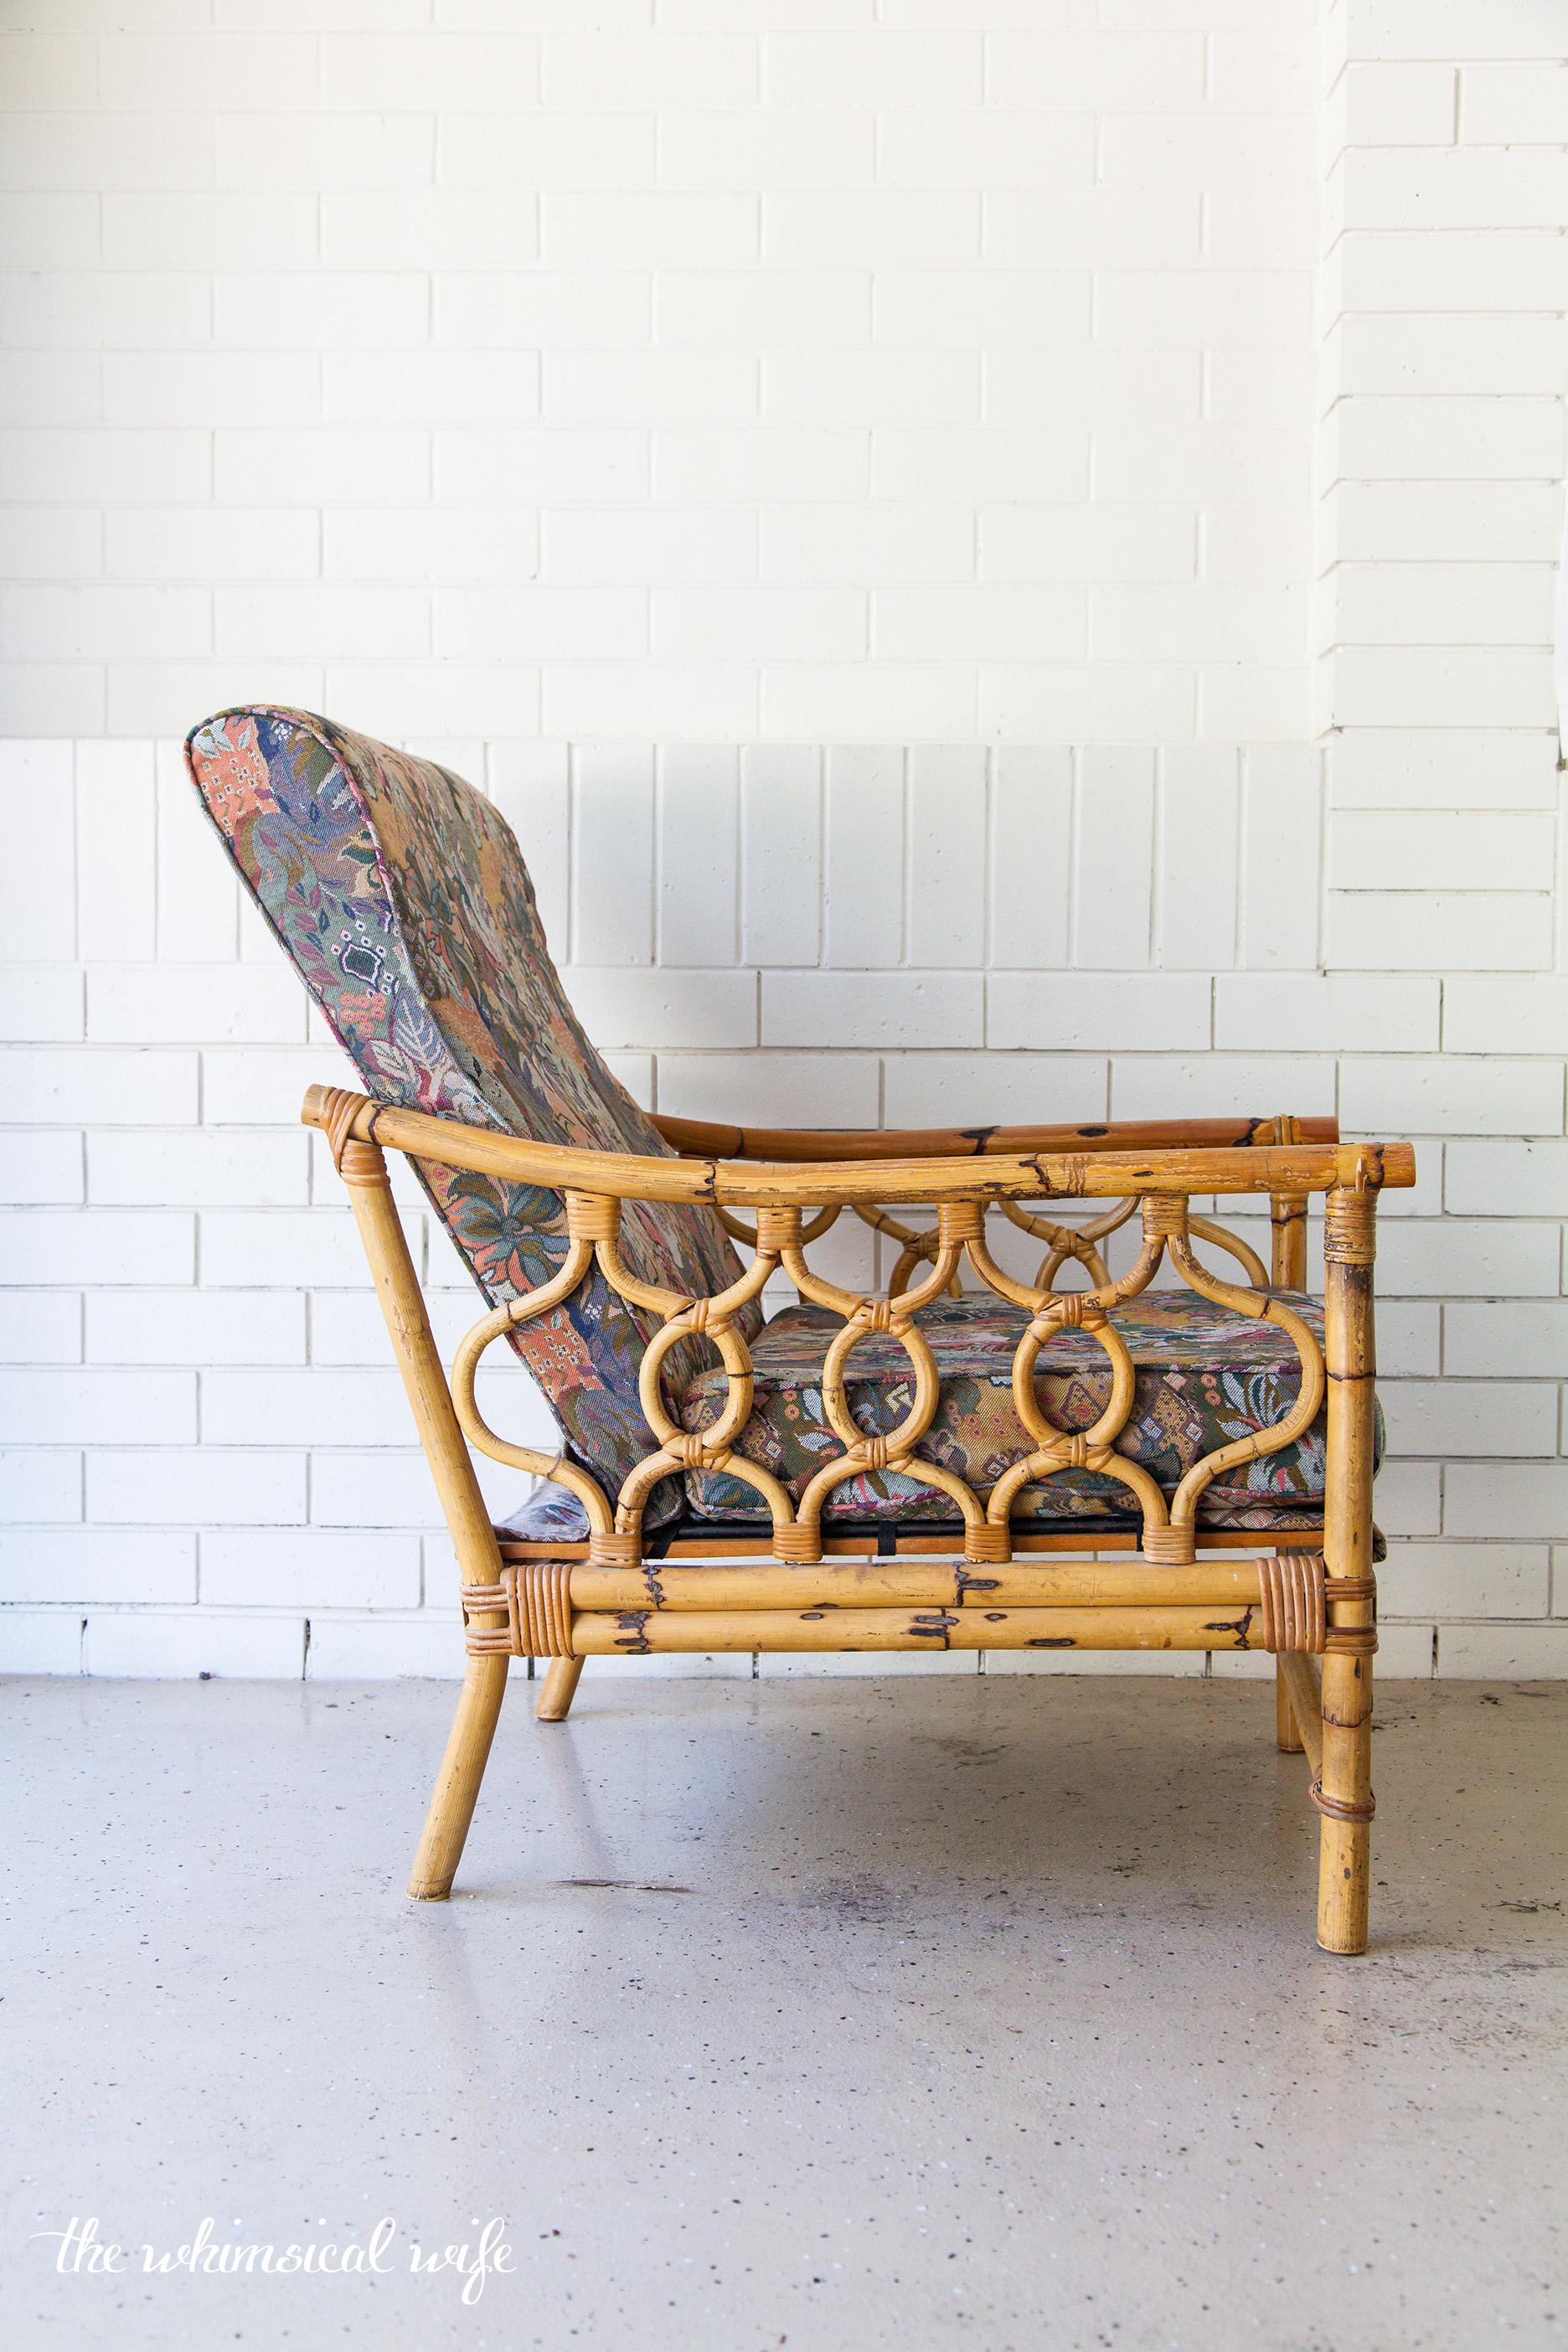 Bamboo Chair-3336.jpg